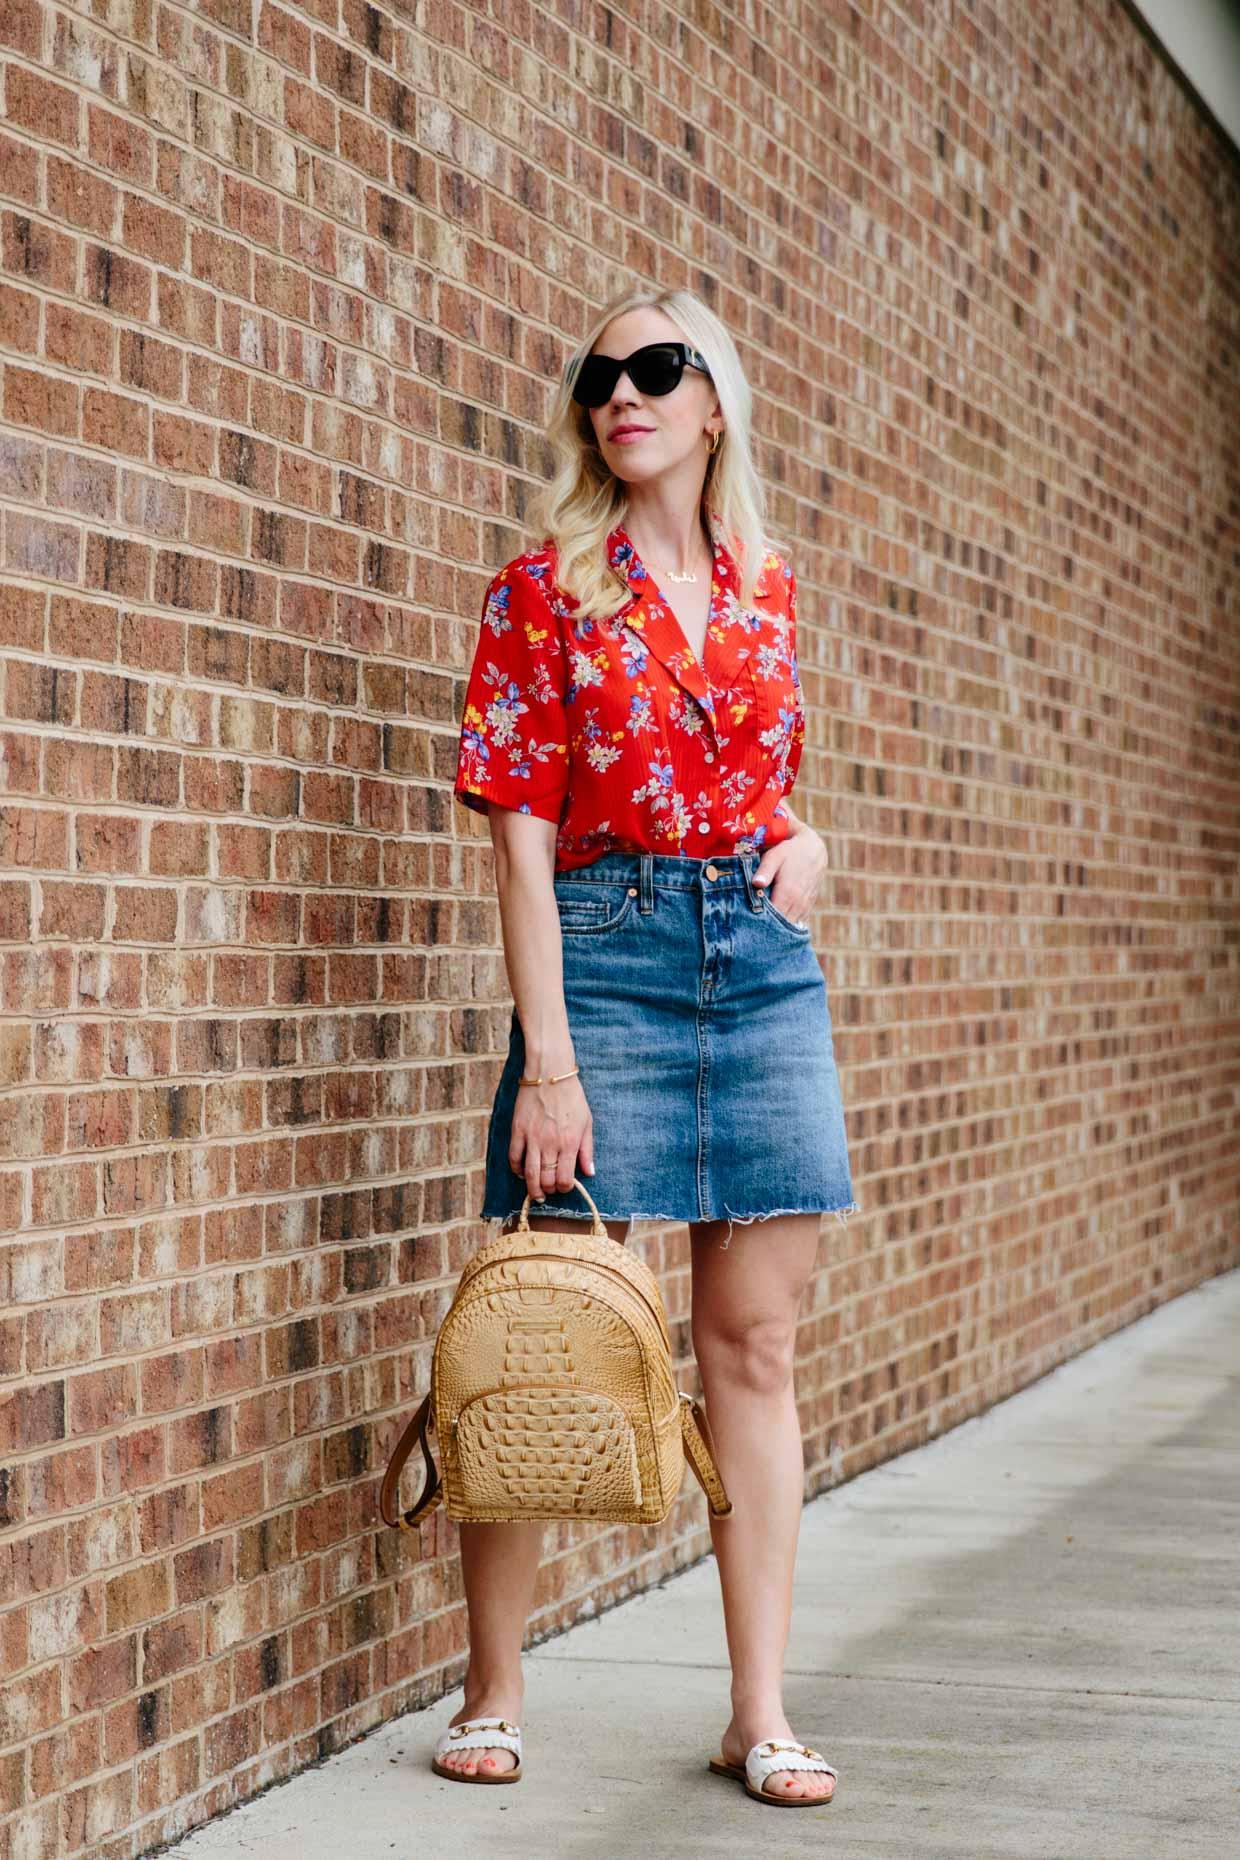 7339d9bf681161 Meagan Brandon fashion blogger of Meagan's Moda wears retro floral print  shirt with denim mini skirt and white Gucci slide sandals, Brahmin Mini  Dartmouth ...